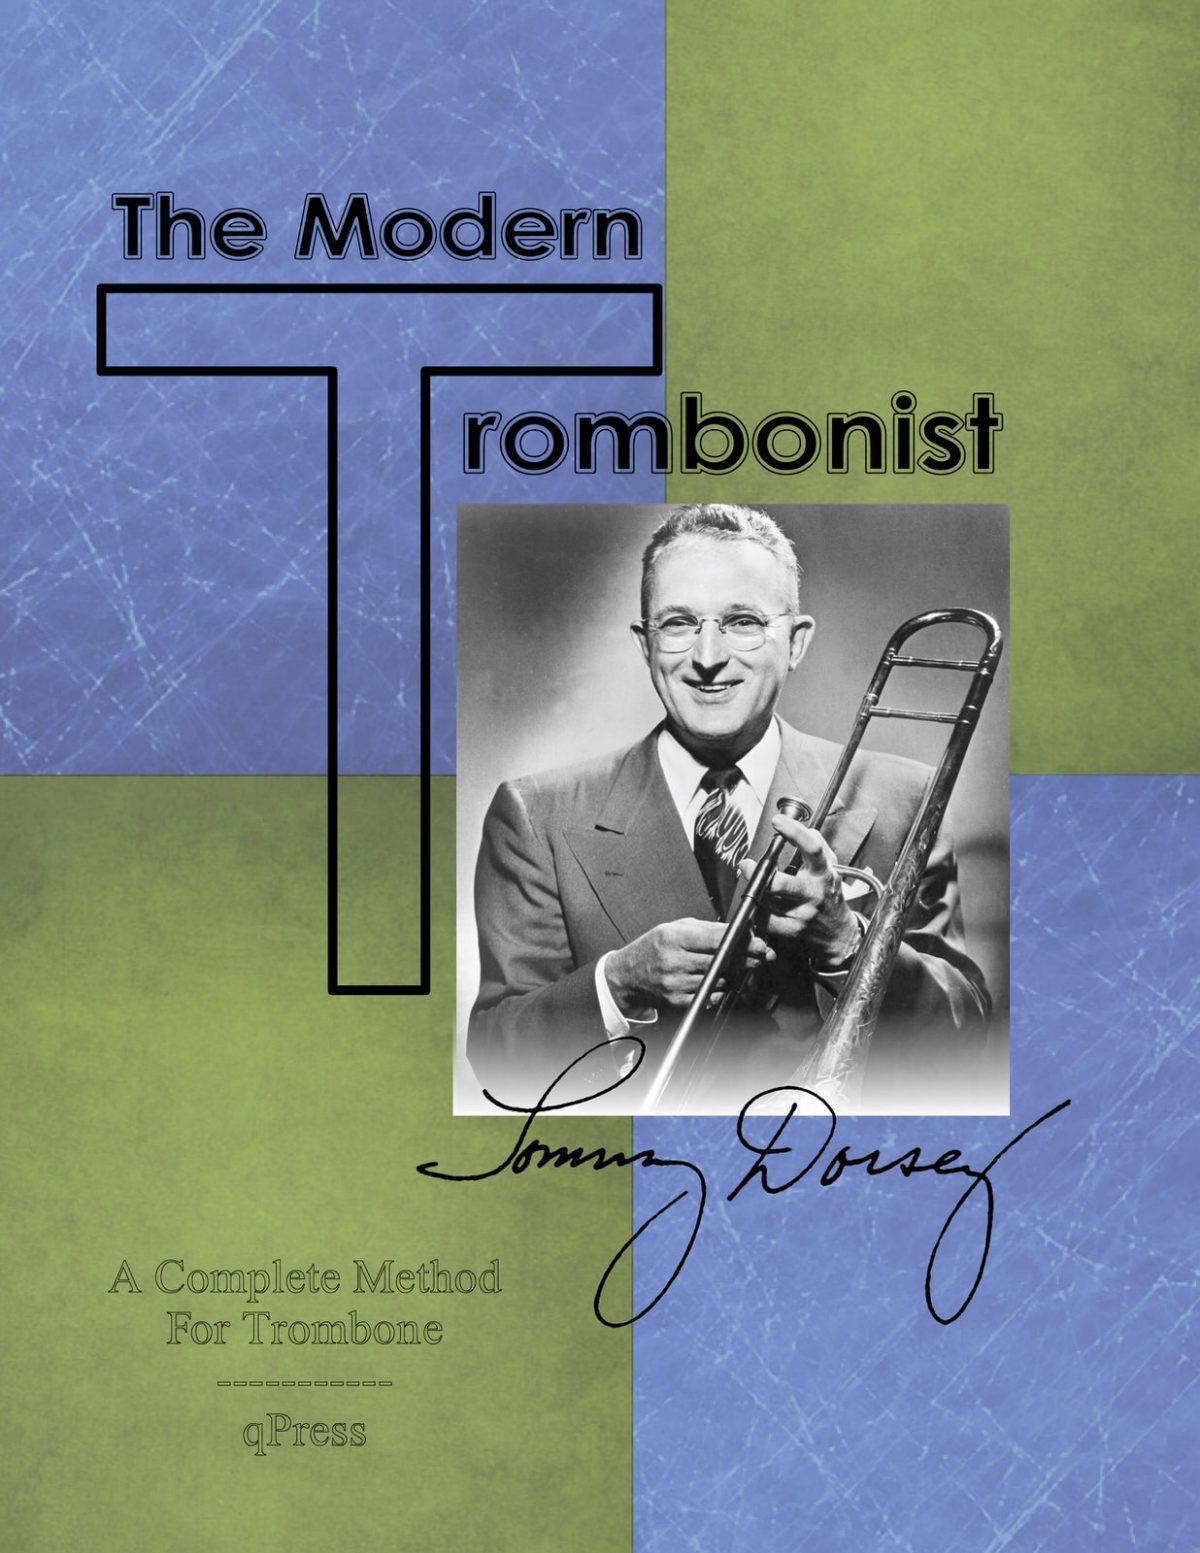 Clean Dorsey, The Modern Trombonist